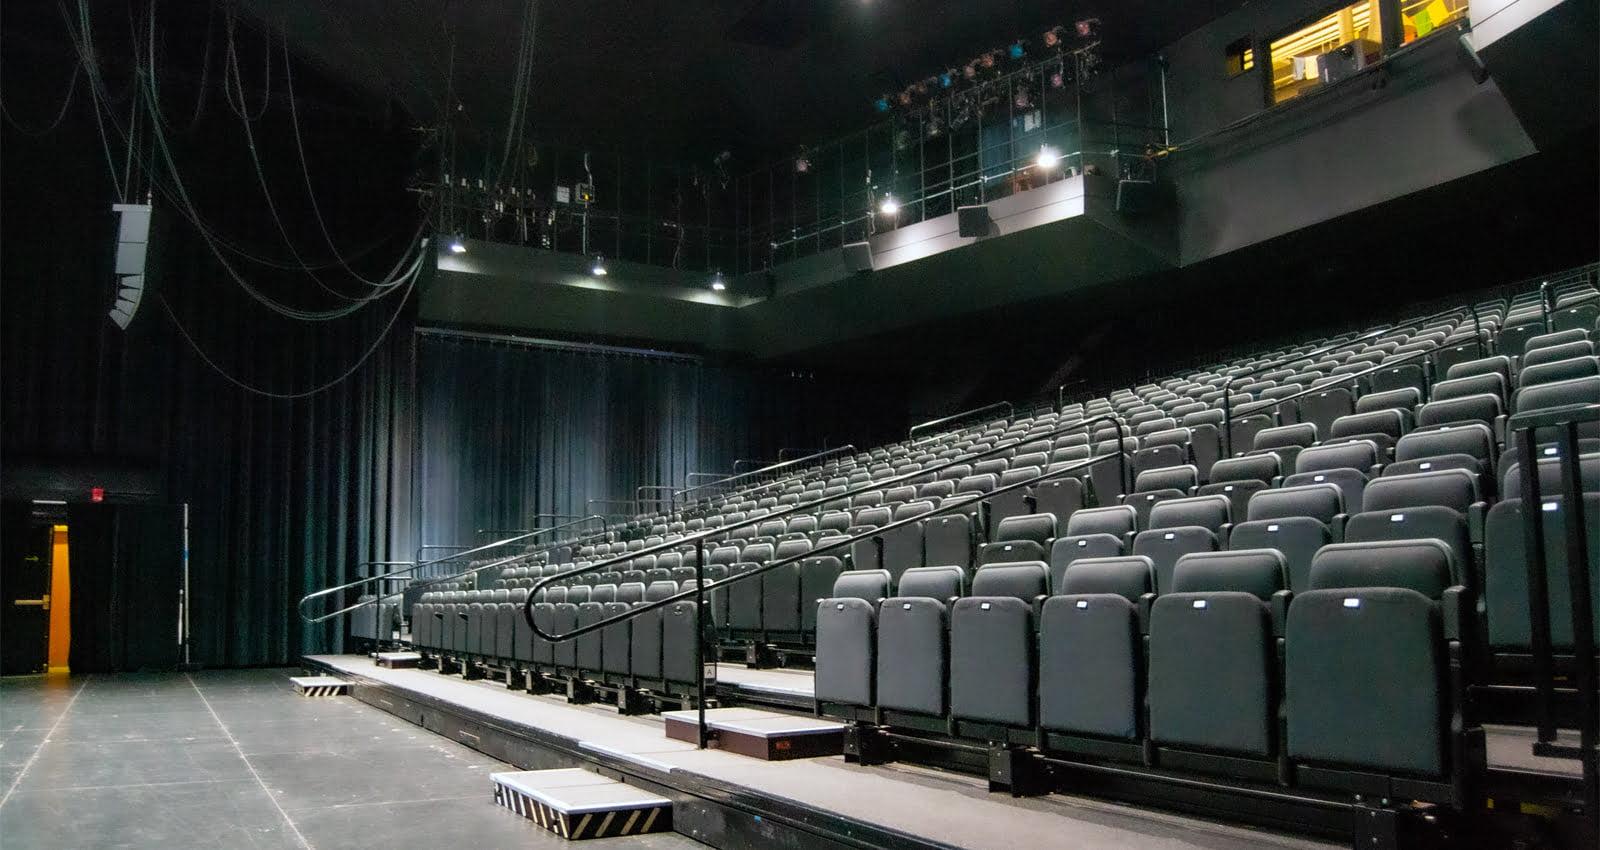 AFrey_Capital-Saratoga Region - Proctors Theatre, 434-seat GE Theatre